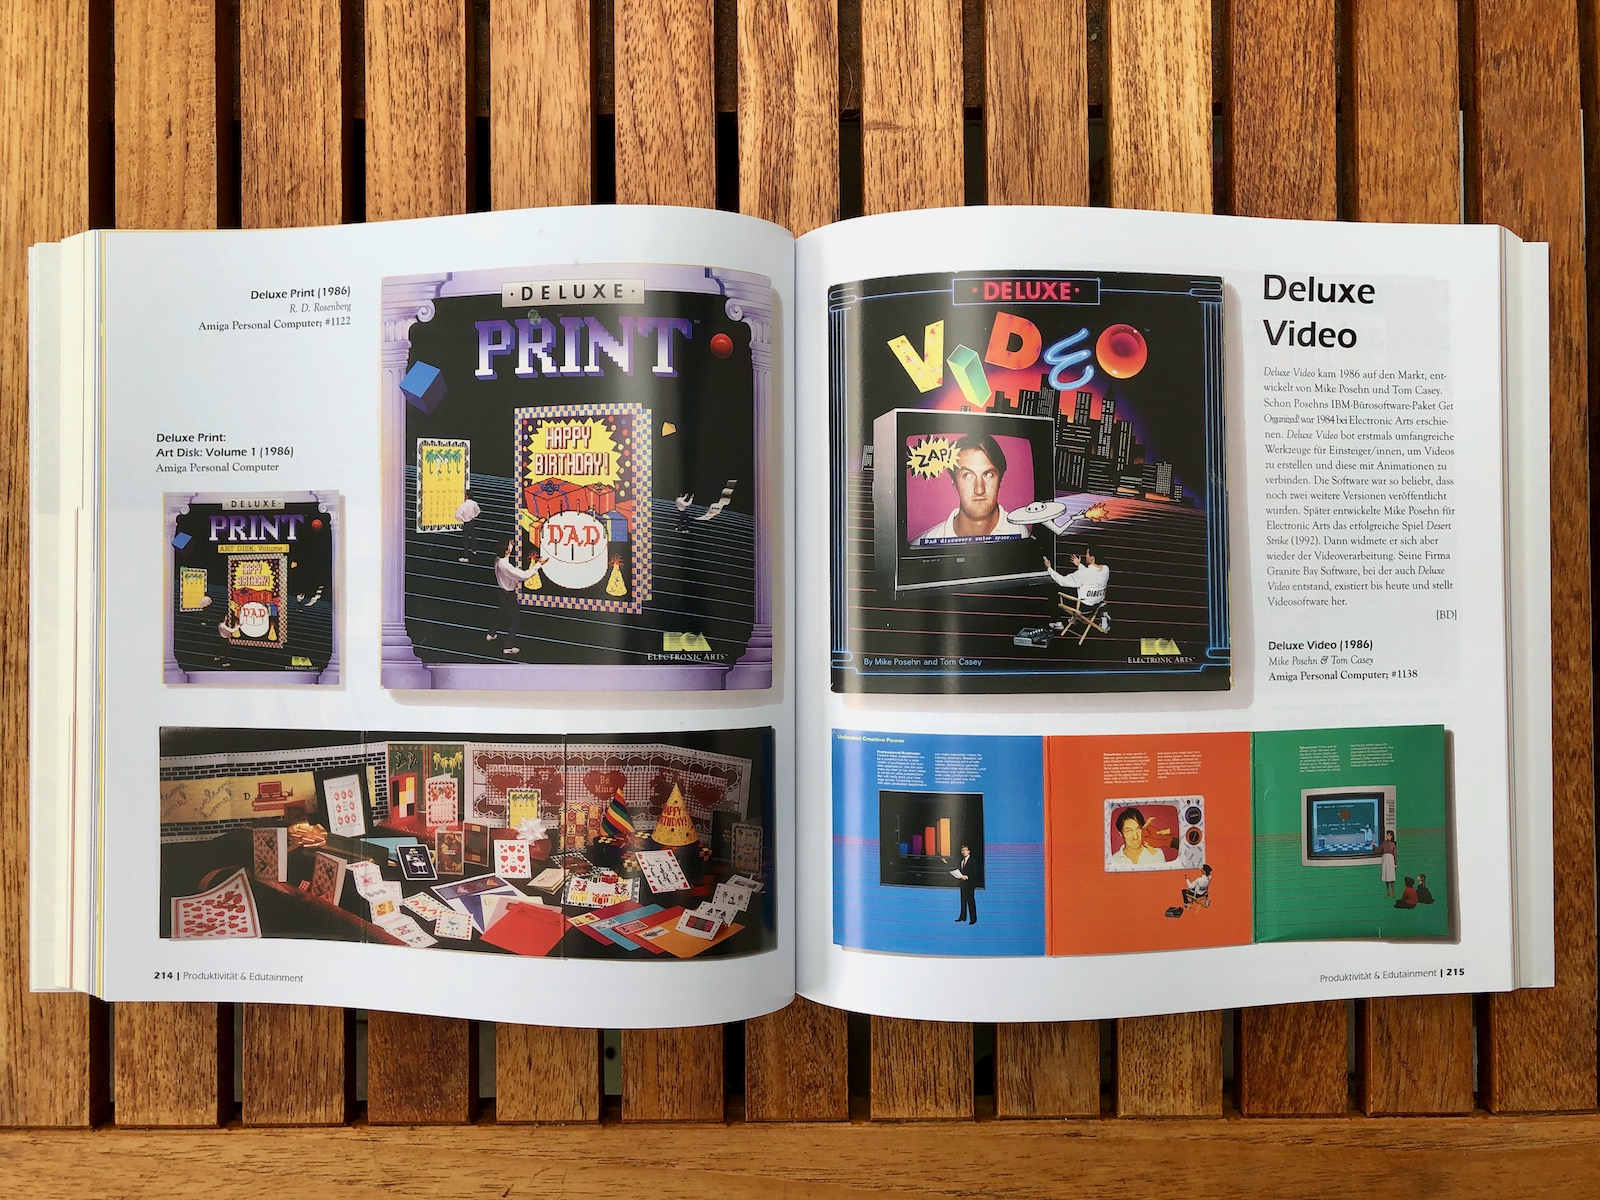 Doppelseite aus dem Katalog. (Bild: André Eymann)